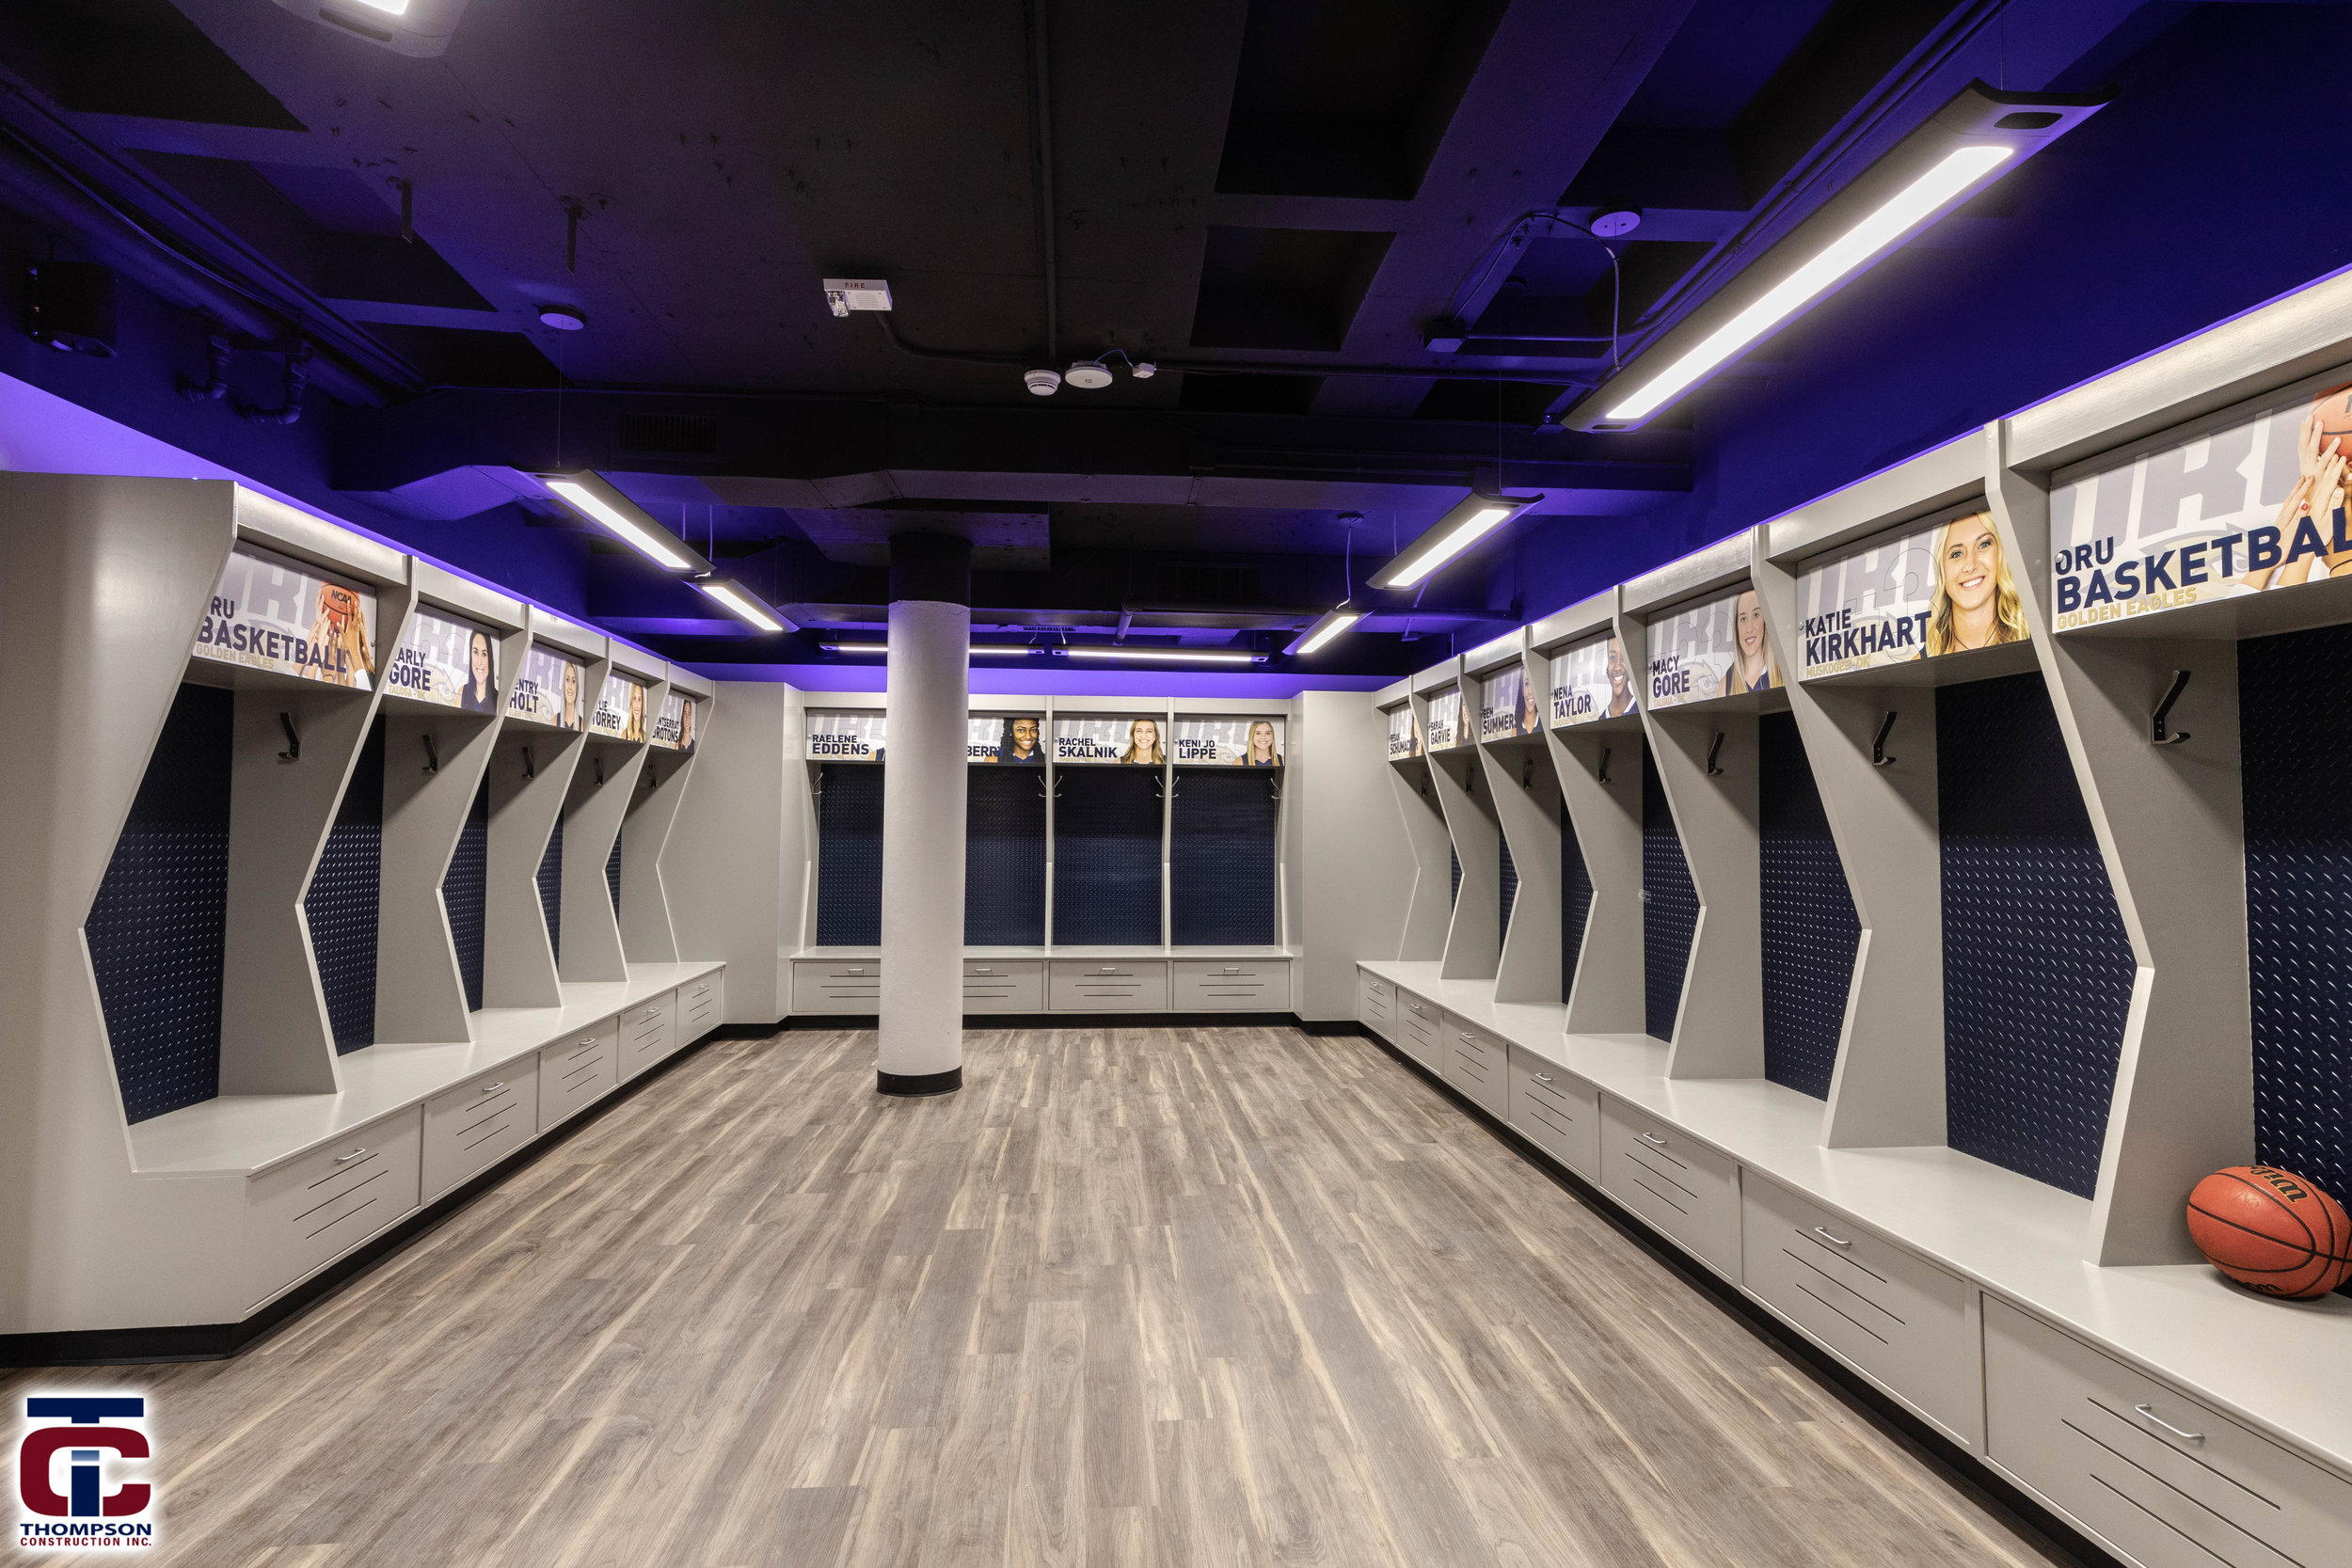 ORU WOMen's basketball locker rooms -